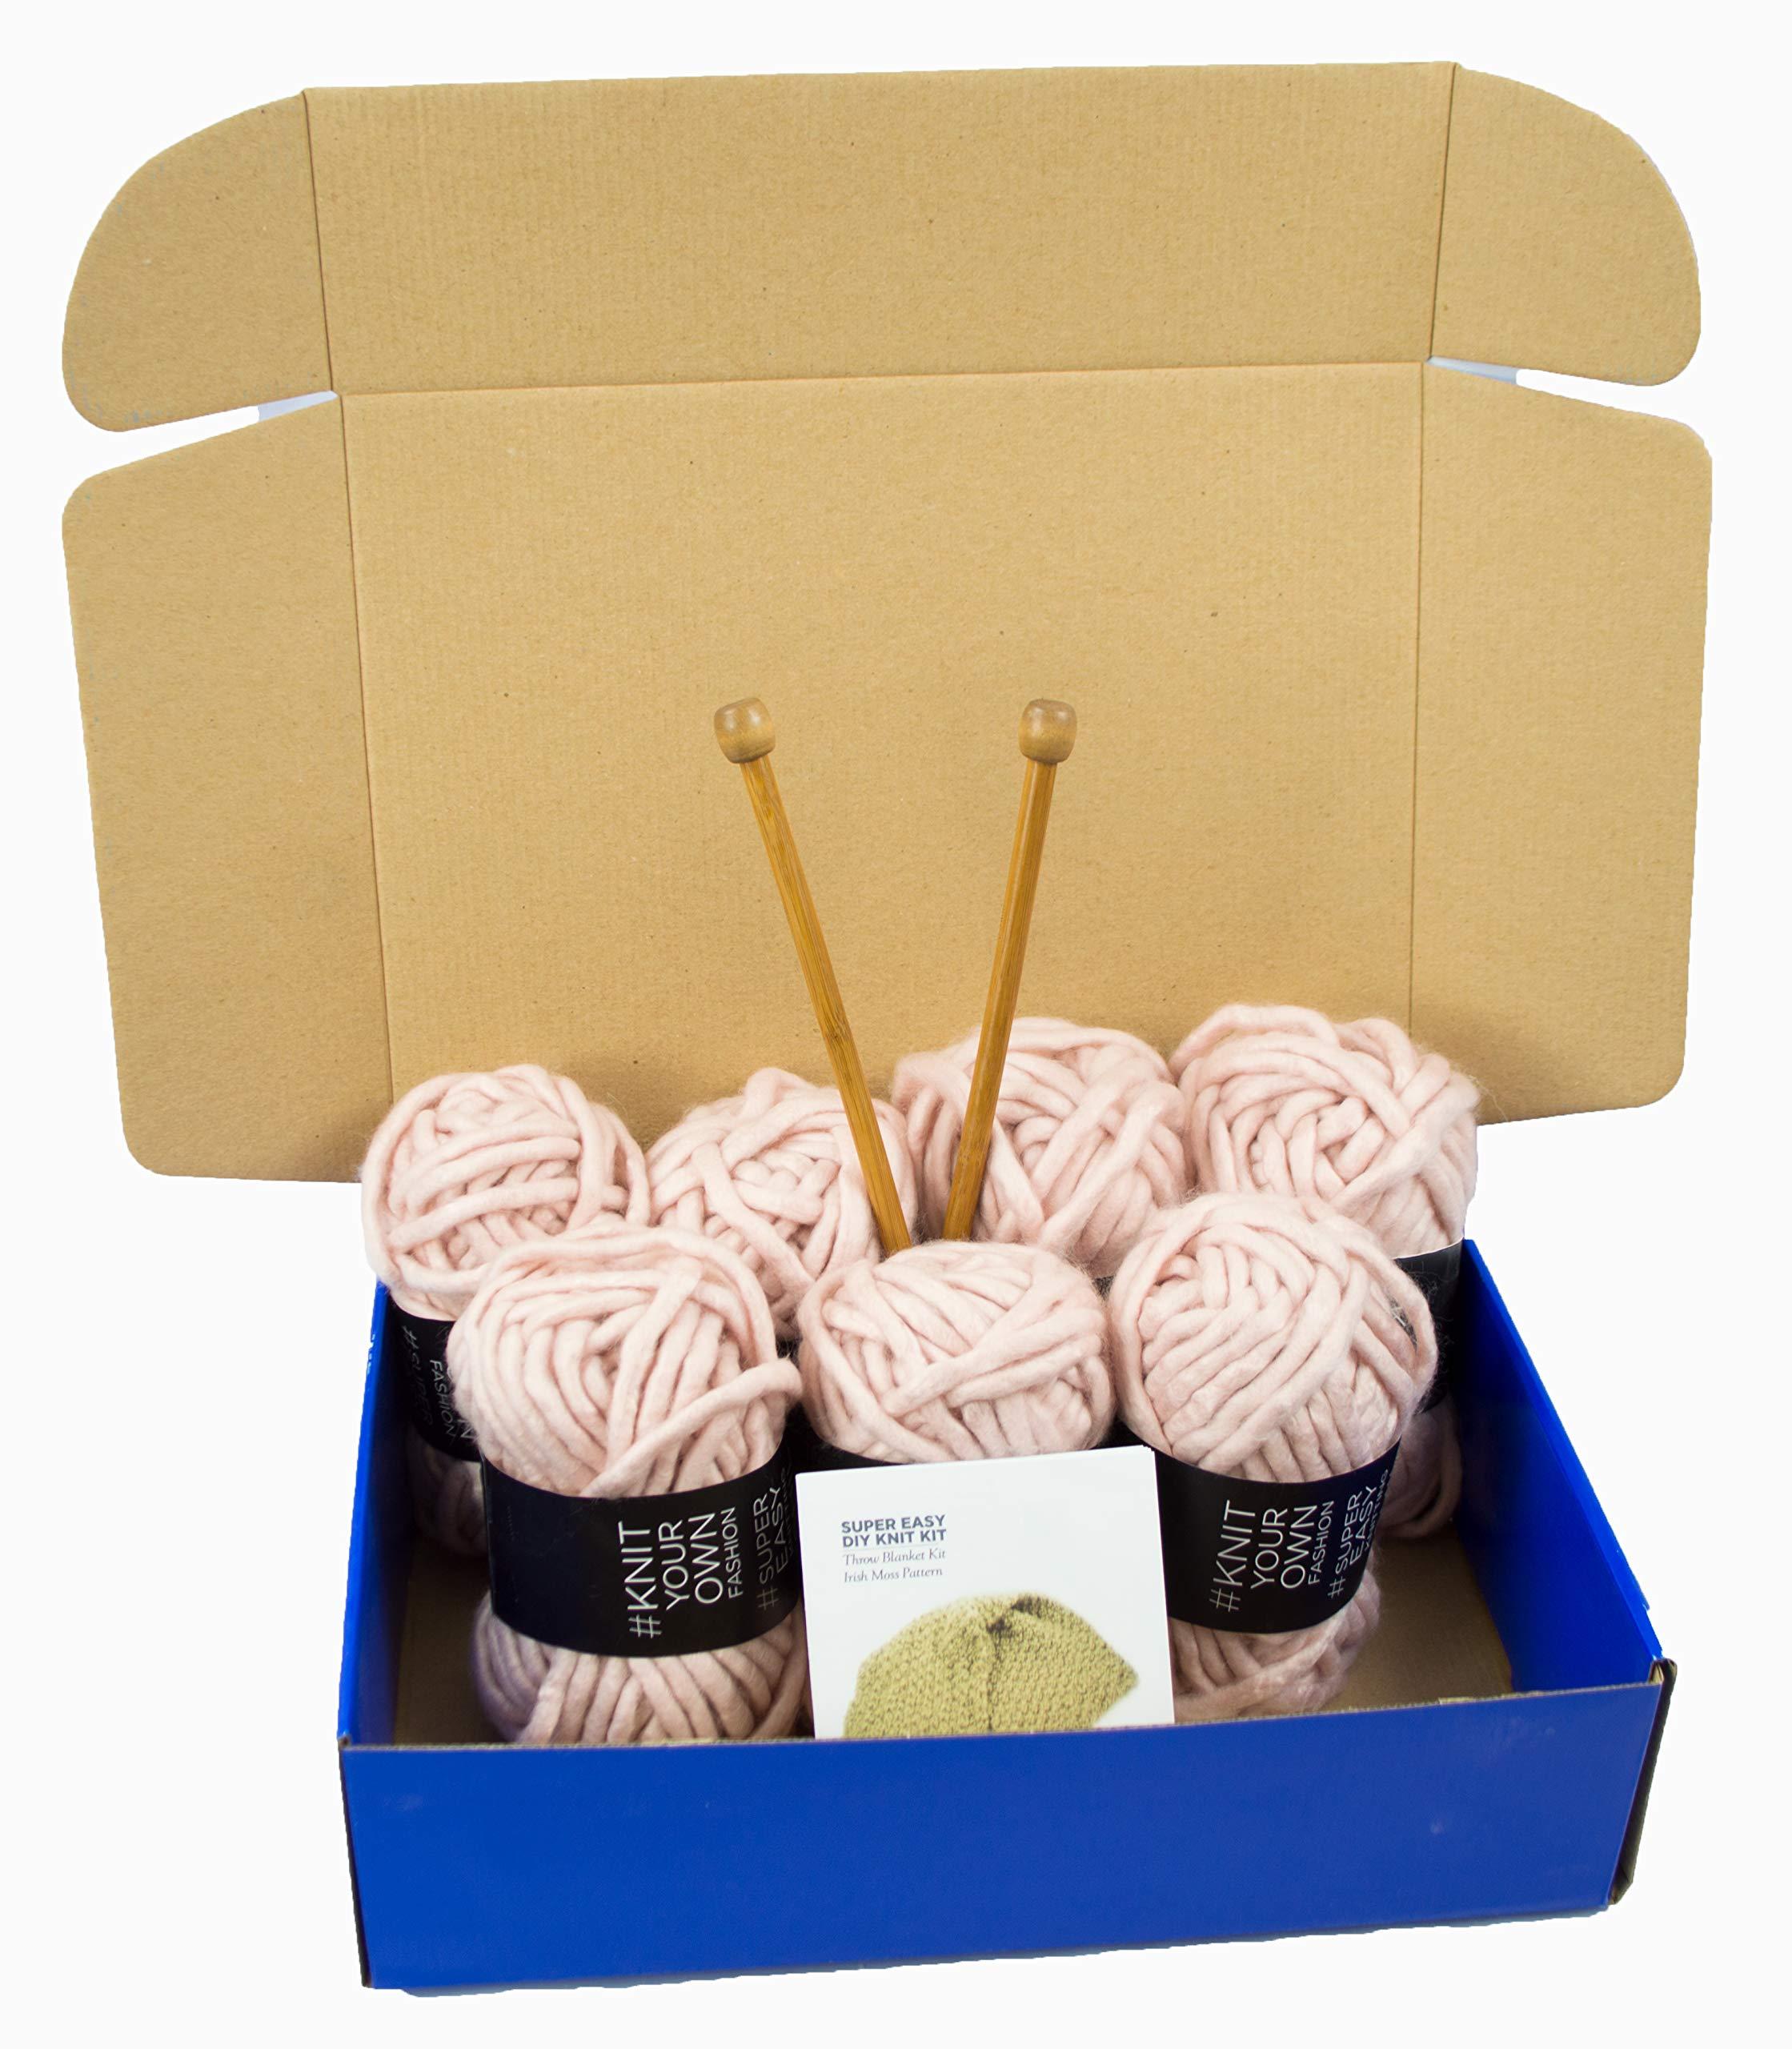 Chunky Knit DIY Throw Blanket Knitting Kit, Super Soft Yarn, US15 10mm Wood Needles (Dusty Pink)